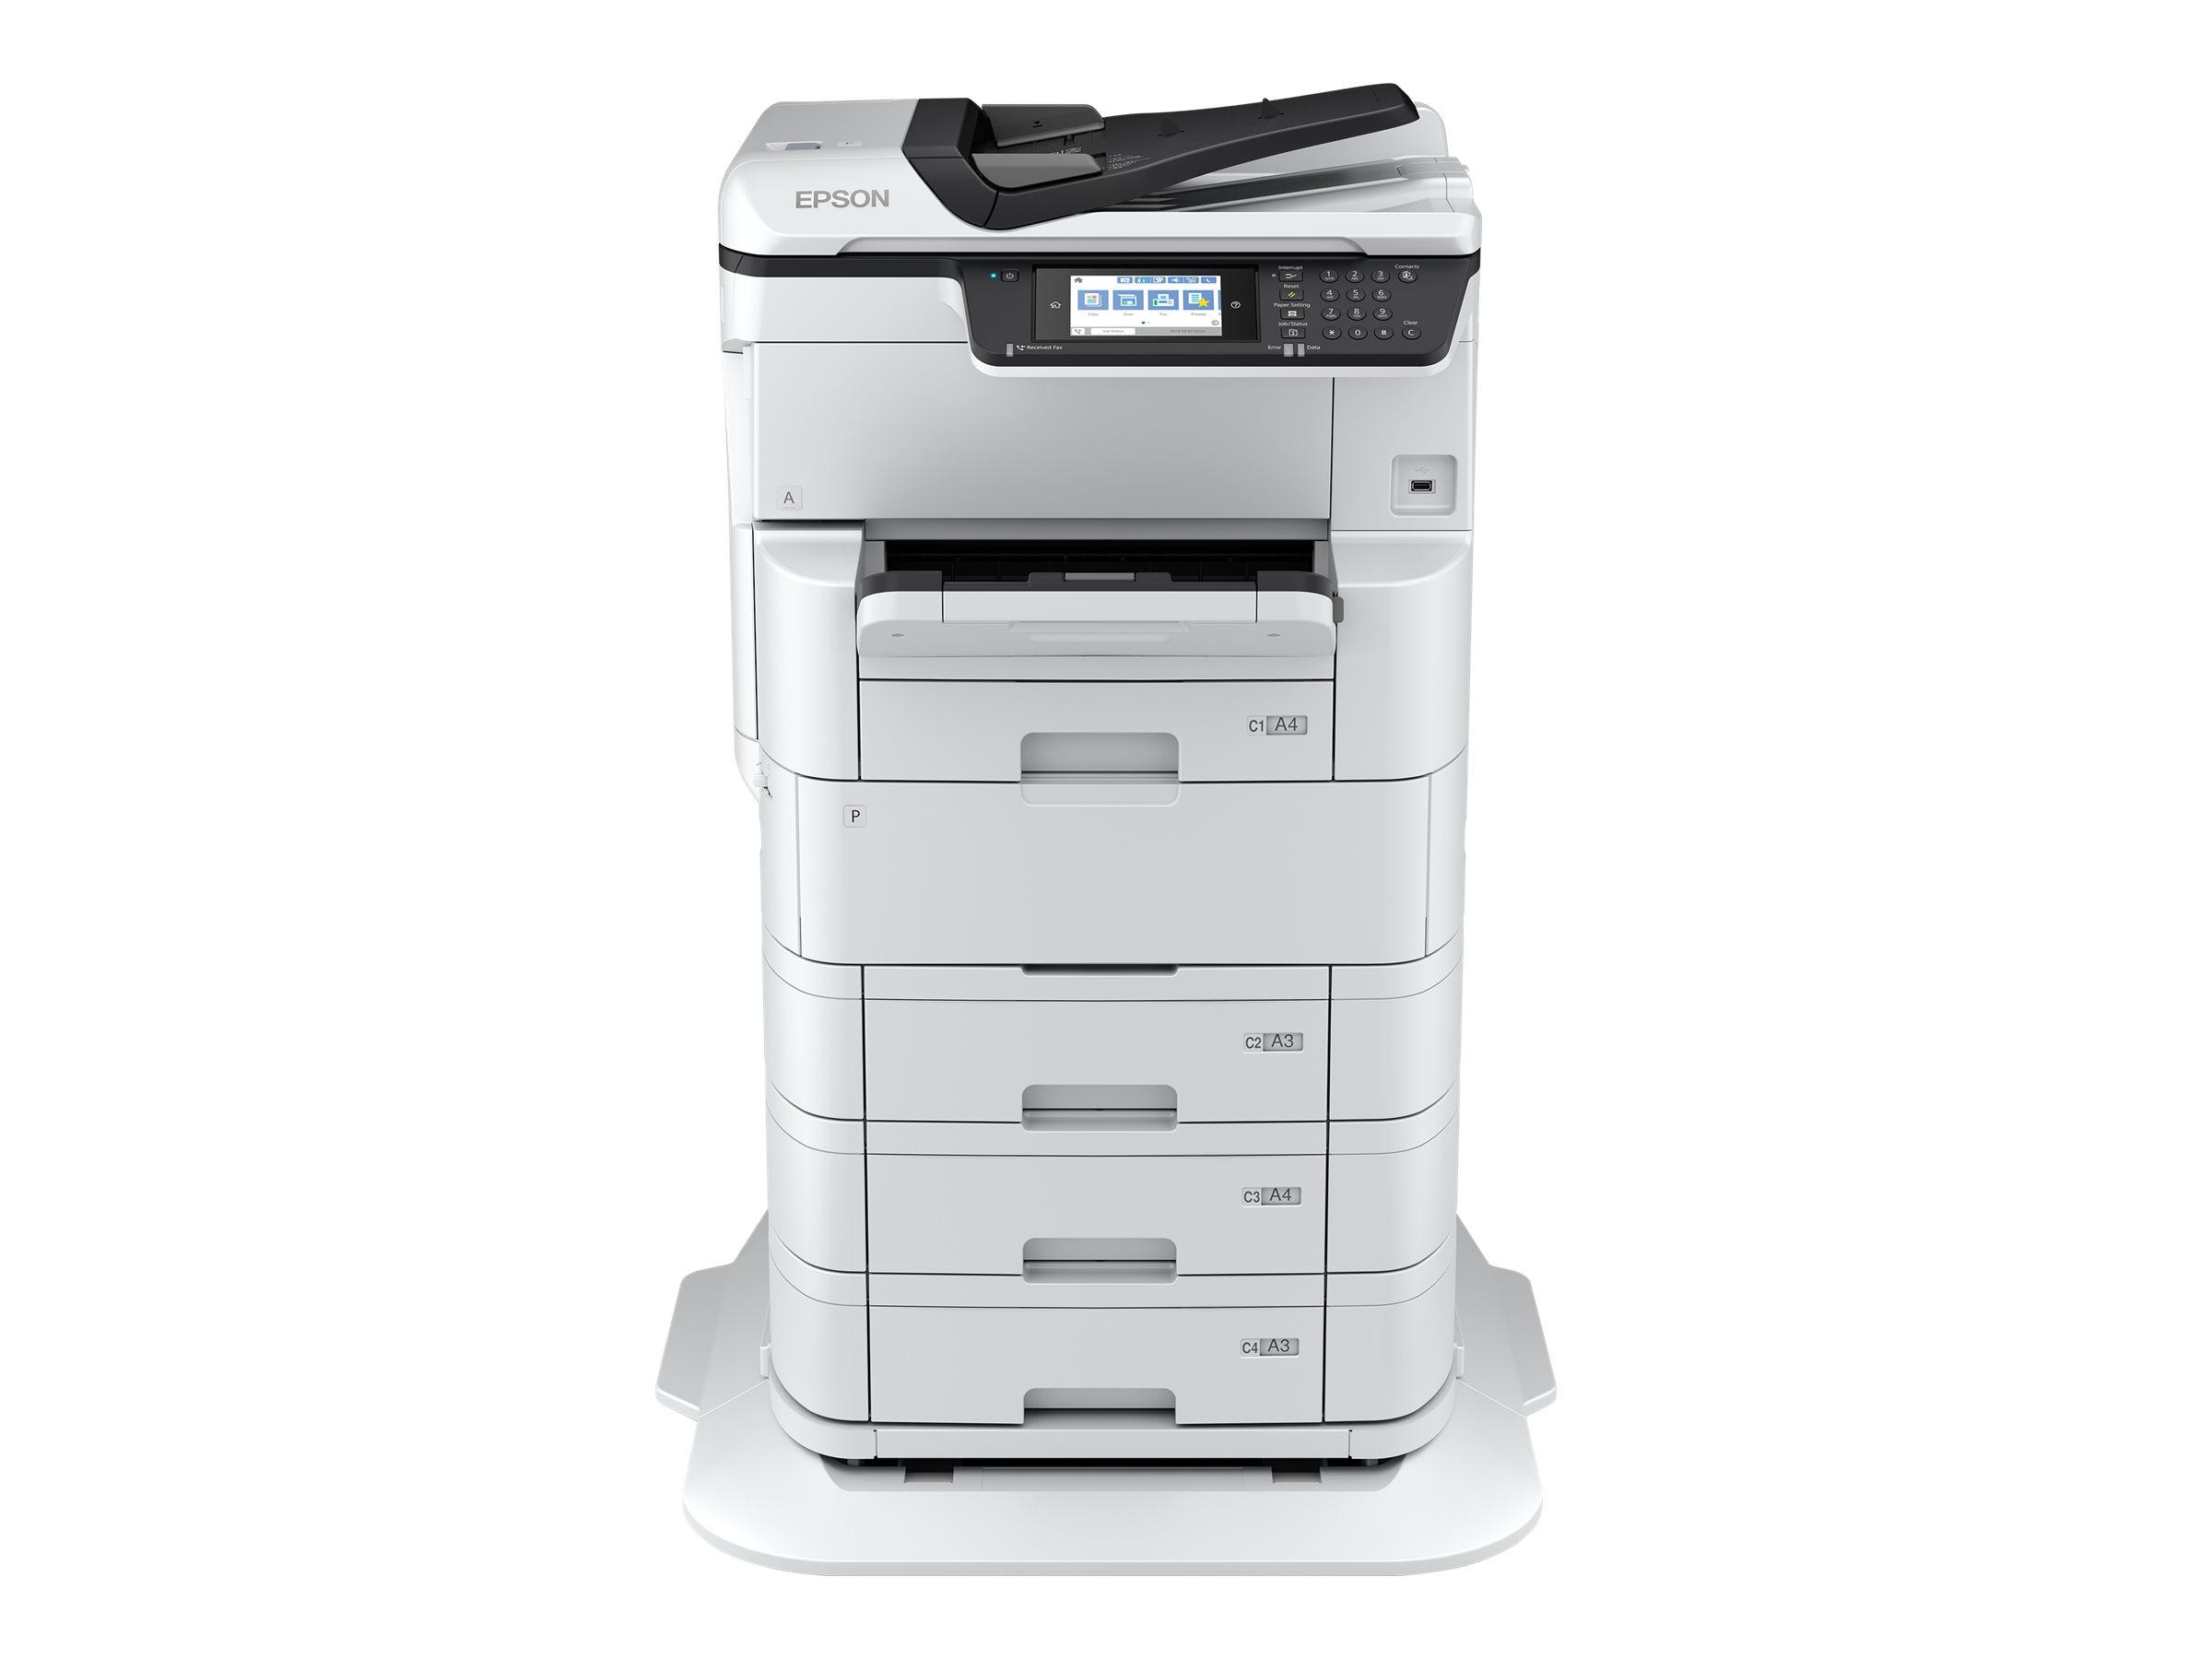 Epson WorkForce Pro WF-C878RD3TWFC - Multifunktionsdrucker - Farbe - Tintenstrahl - A3 (297 x 420 mm) (Original) - A3 (Medien)